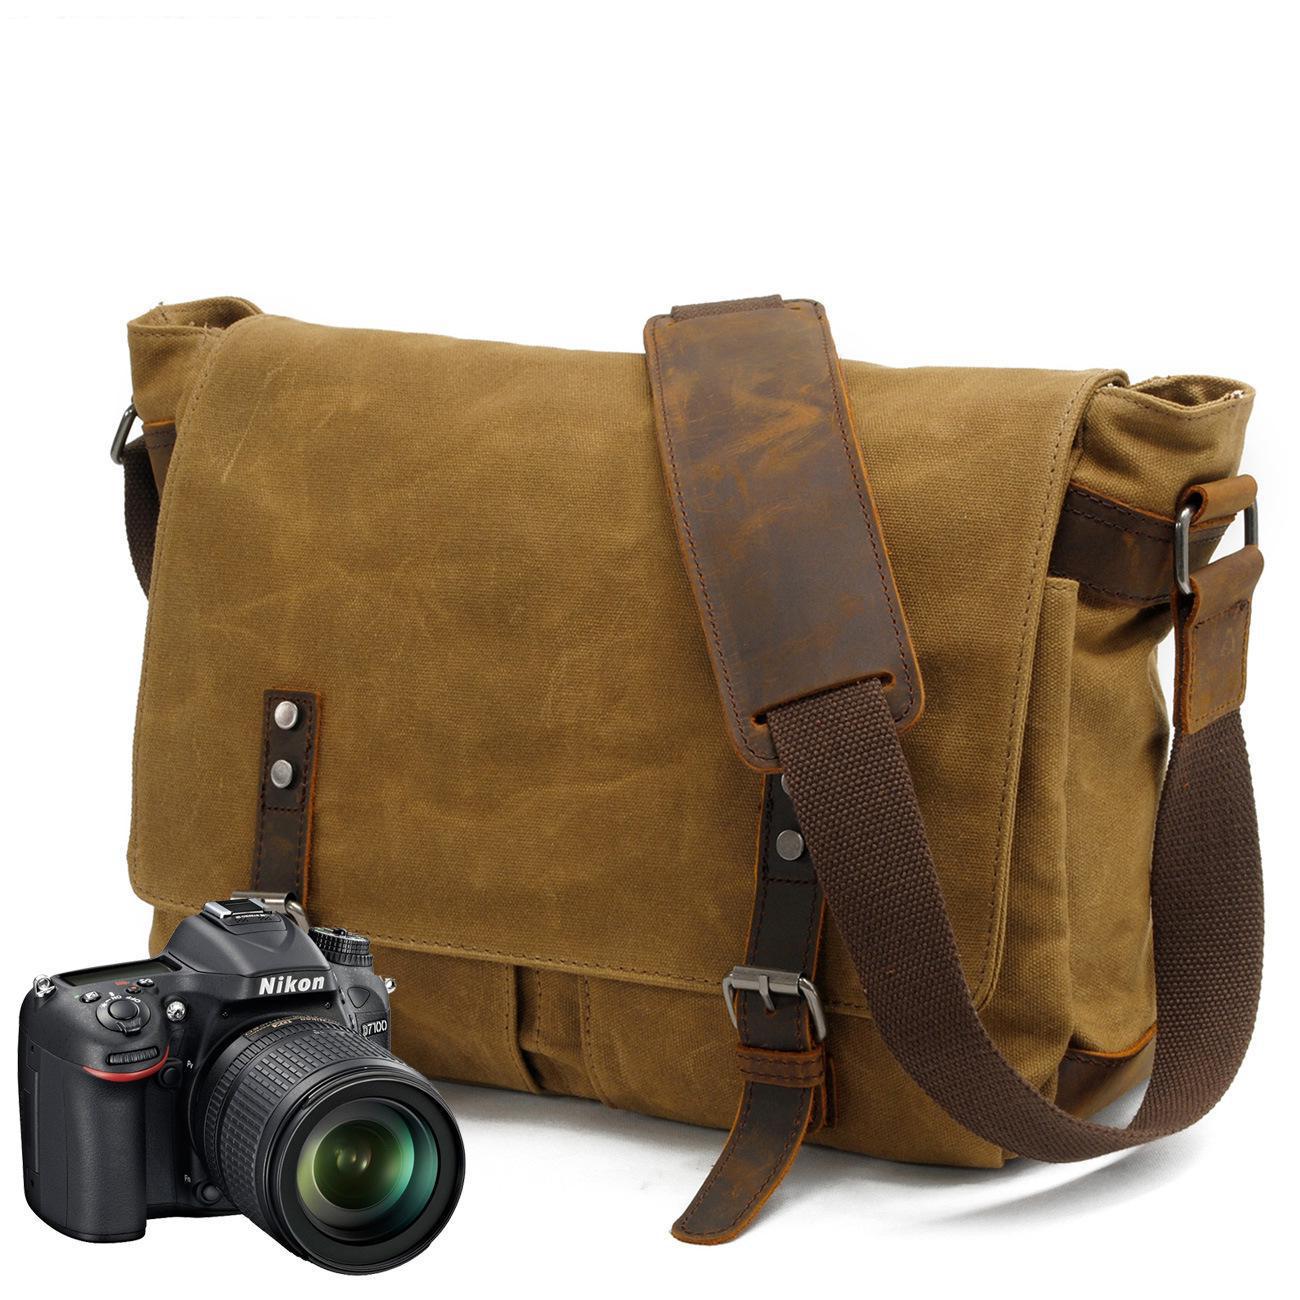 New Men Messenger Bag Oil Wax Waterproof Canvas Crossbody Shoulder Bag Portable Vintage Camera Handbag Travel bags High Quality dollice dr 655 canvas camera bag black as domke f7